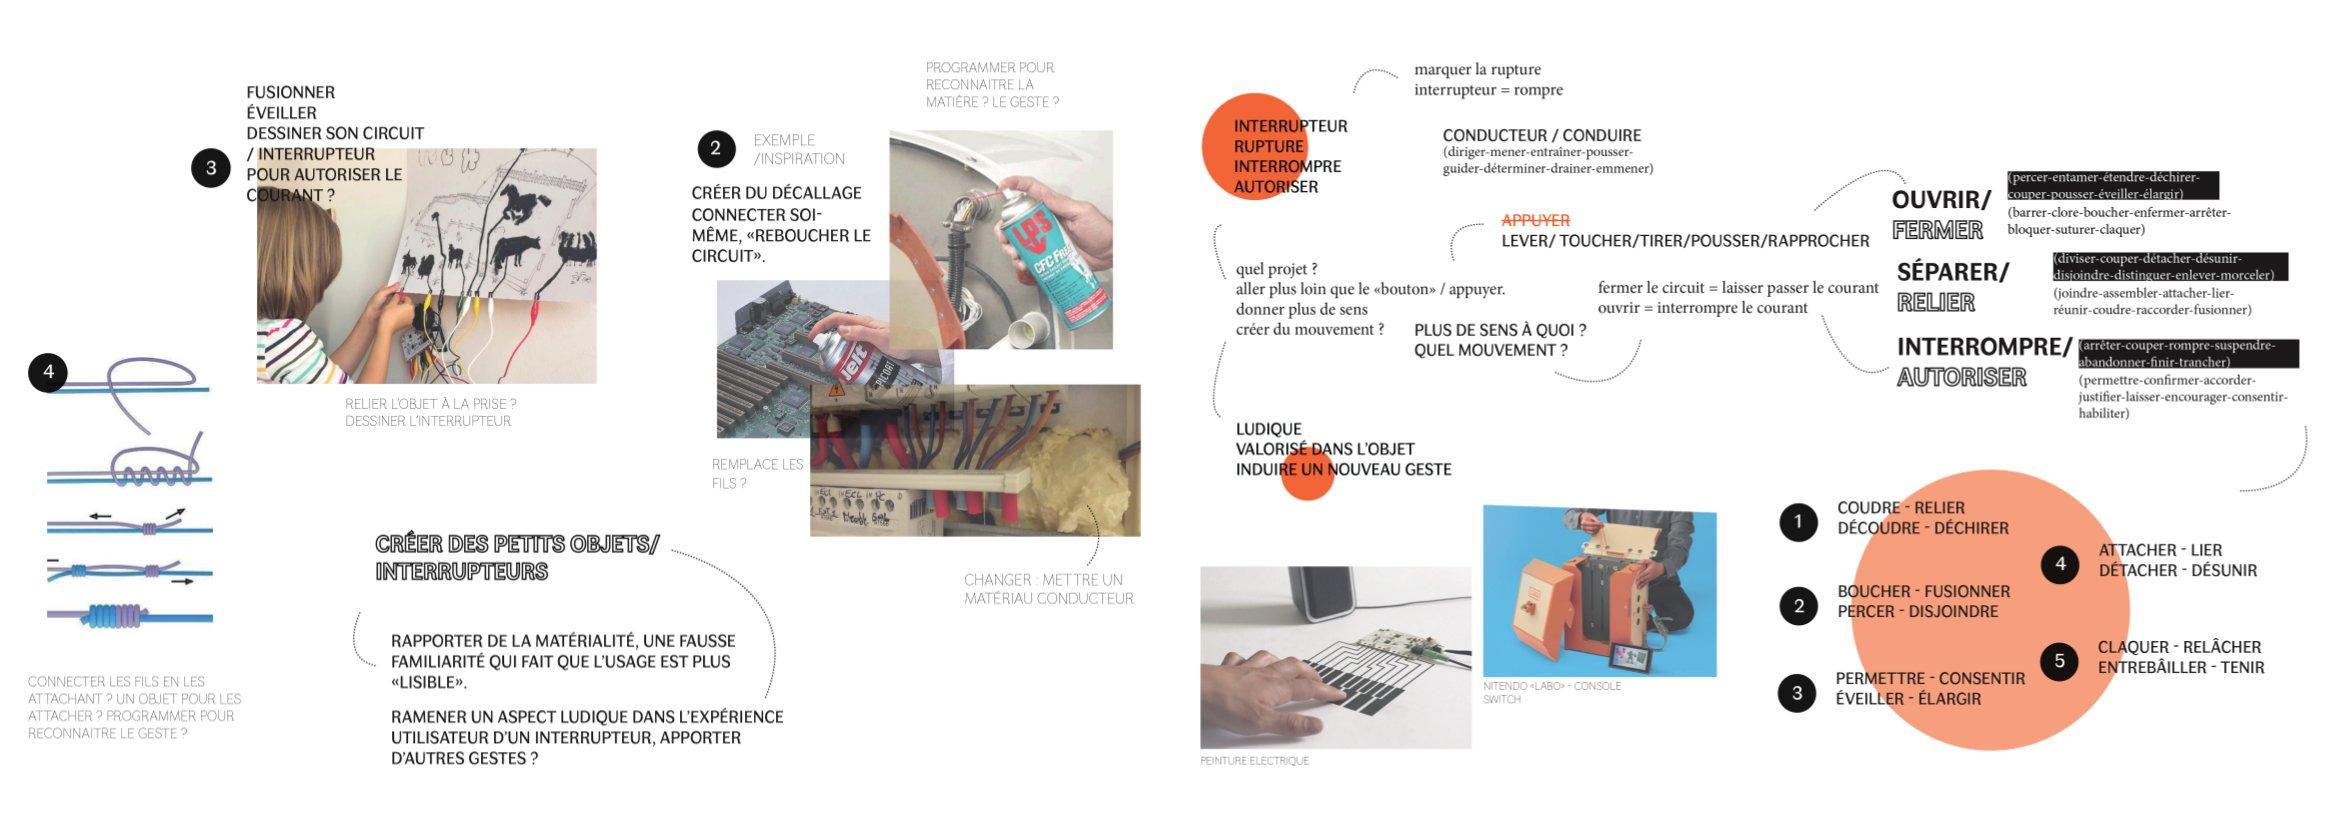 Mendes Mirabito recherches 7